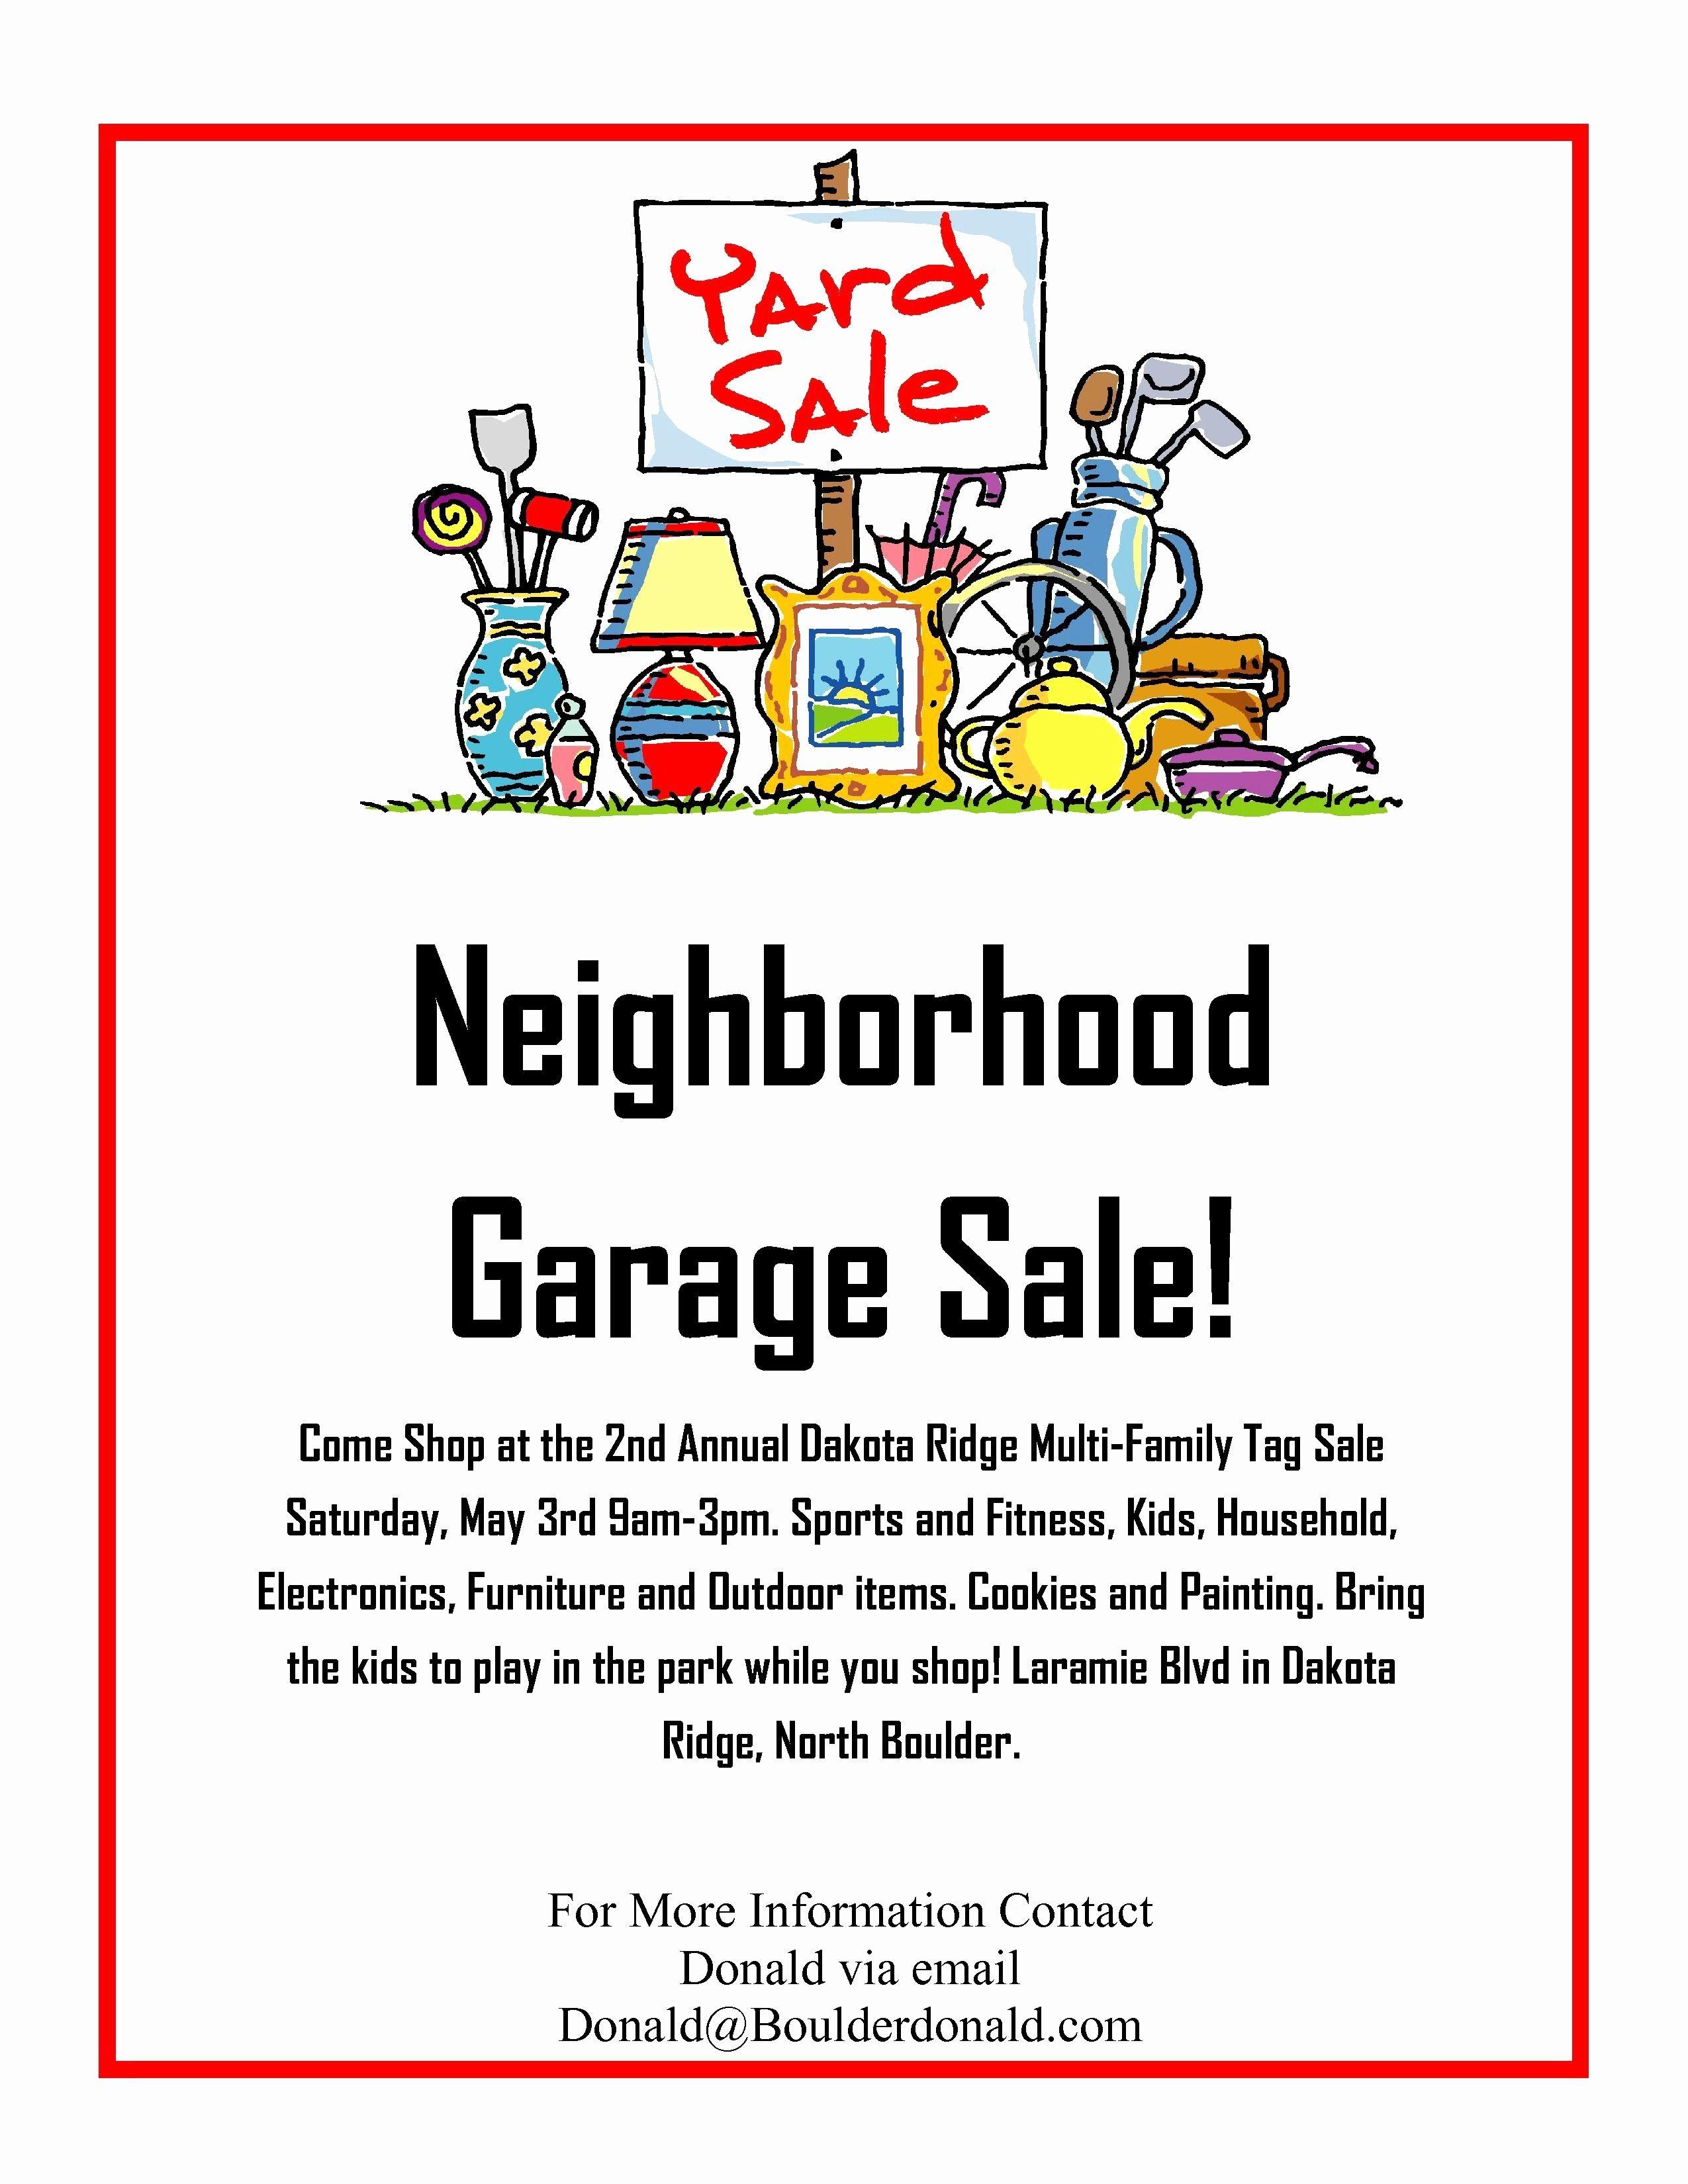 Church Rummage Sale Flyer Template Luxury Yard Sale Flyer Fresh Church Yard Sale Flyer Keninamas Spea Community Garage Sale Sale Flyer Neighborhood Garage Sale